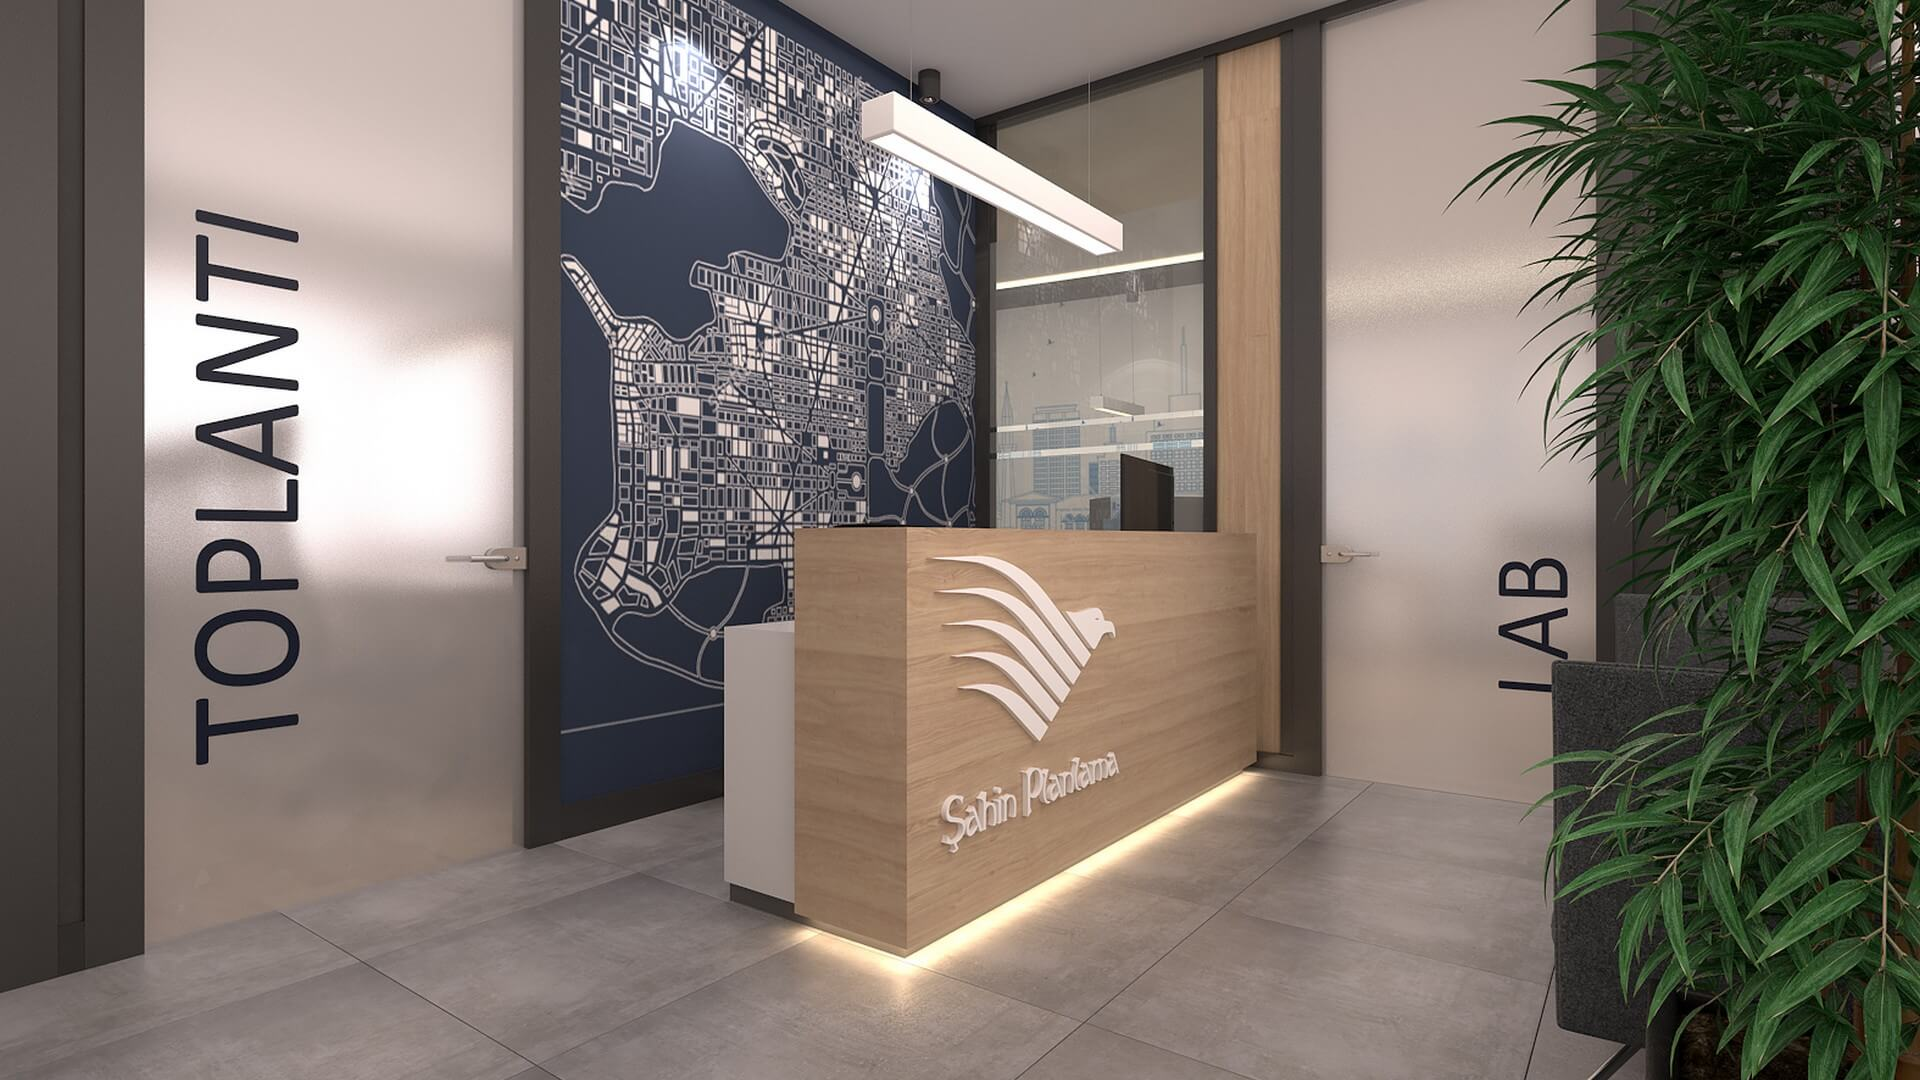 Sahin Planlama Office, Offices